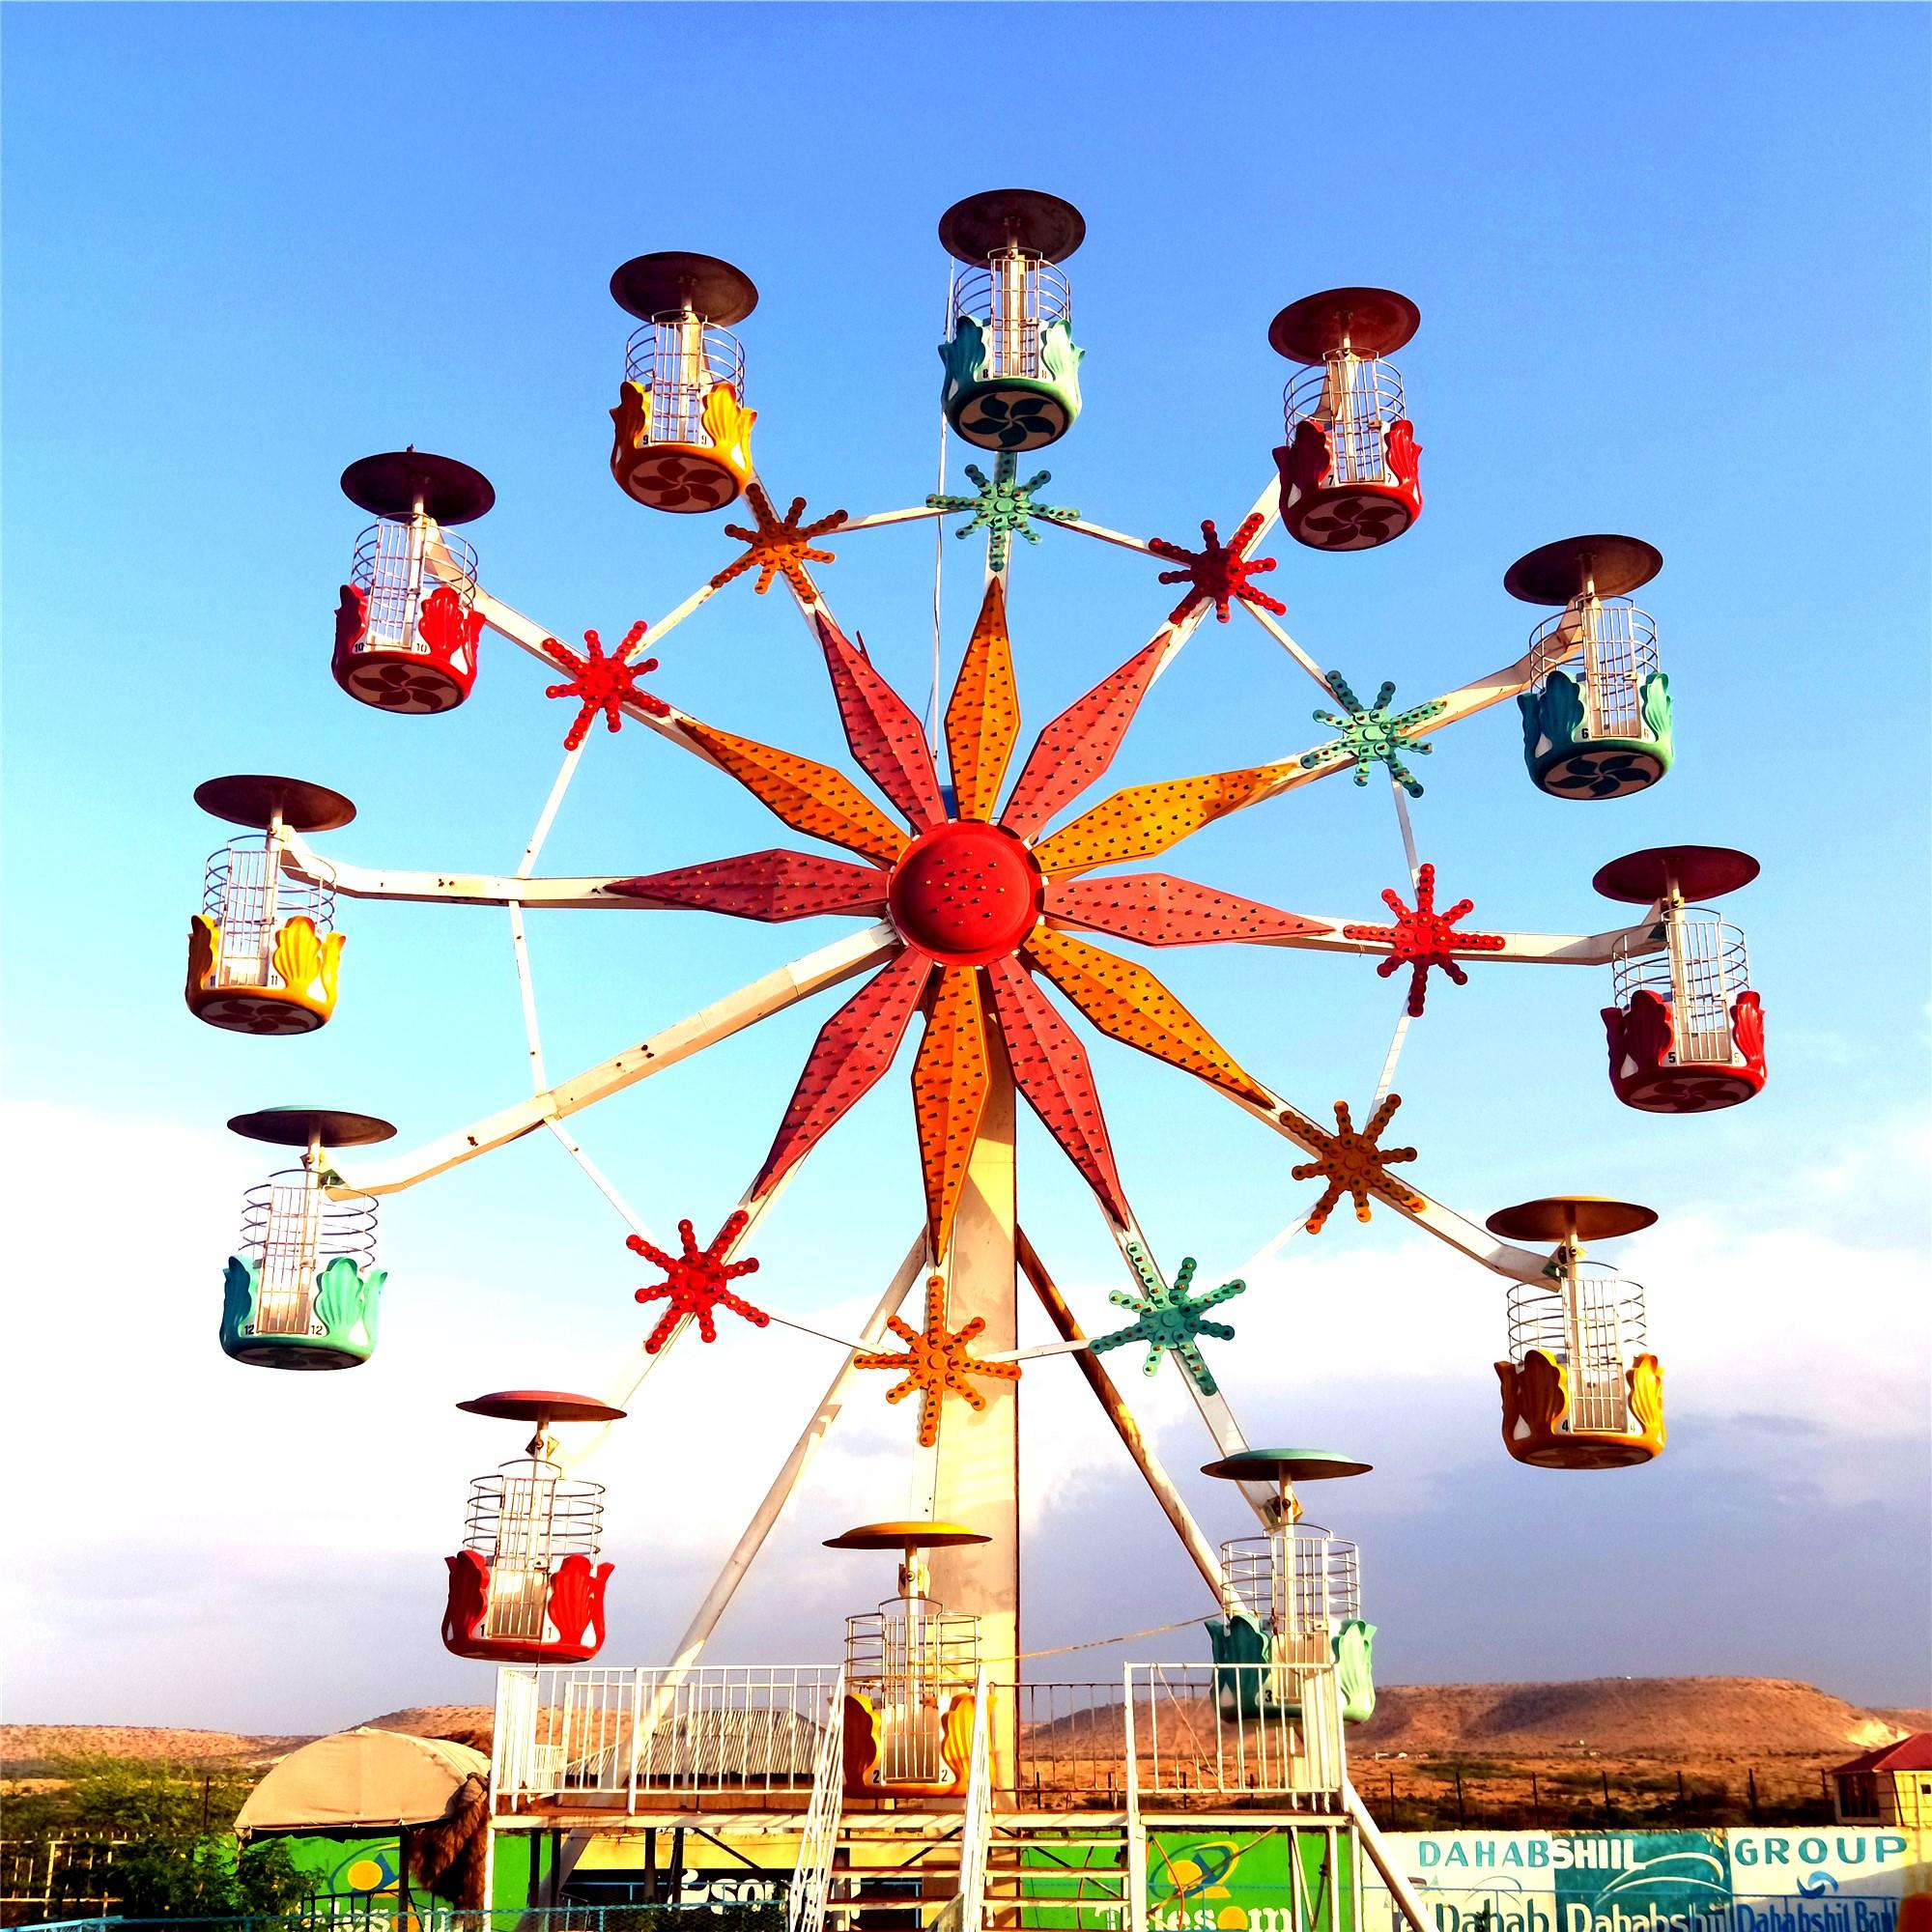 20m high Flower Basket Theme Rark Rides Ferris Wheel